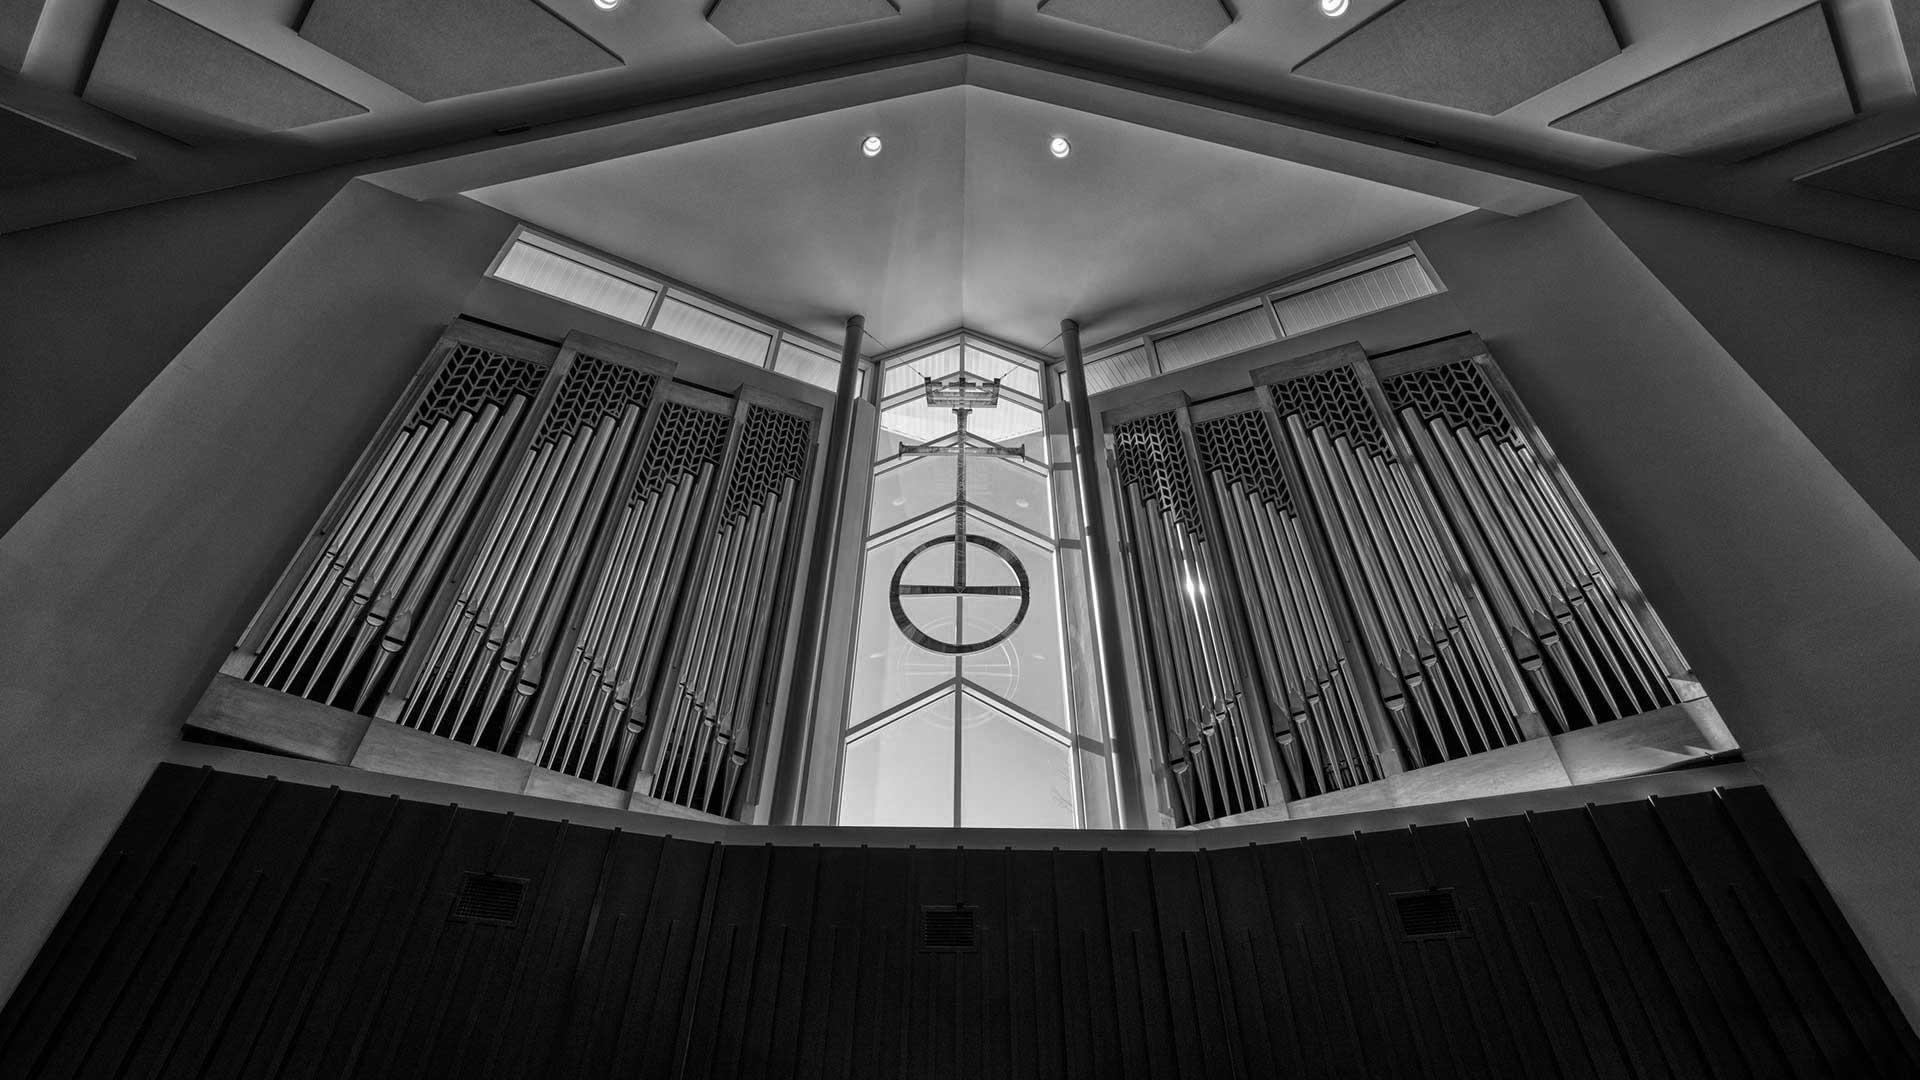 sanctuary-4bw.jpg